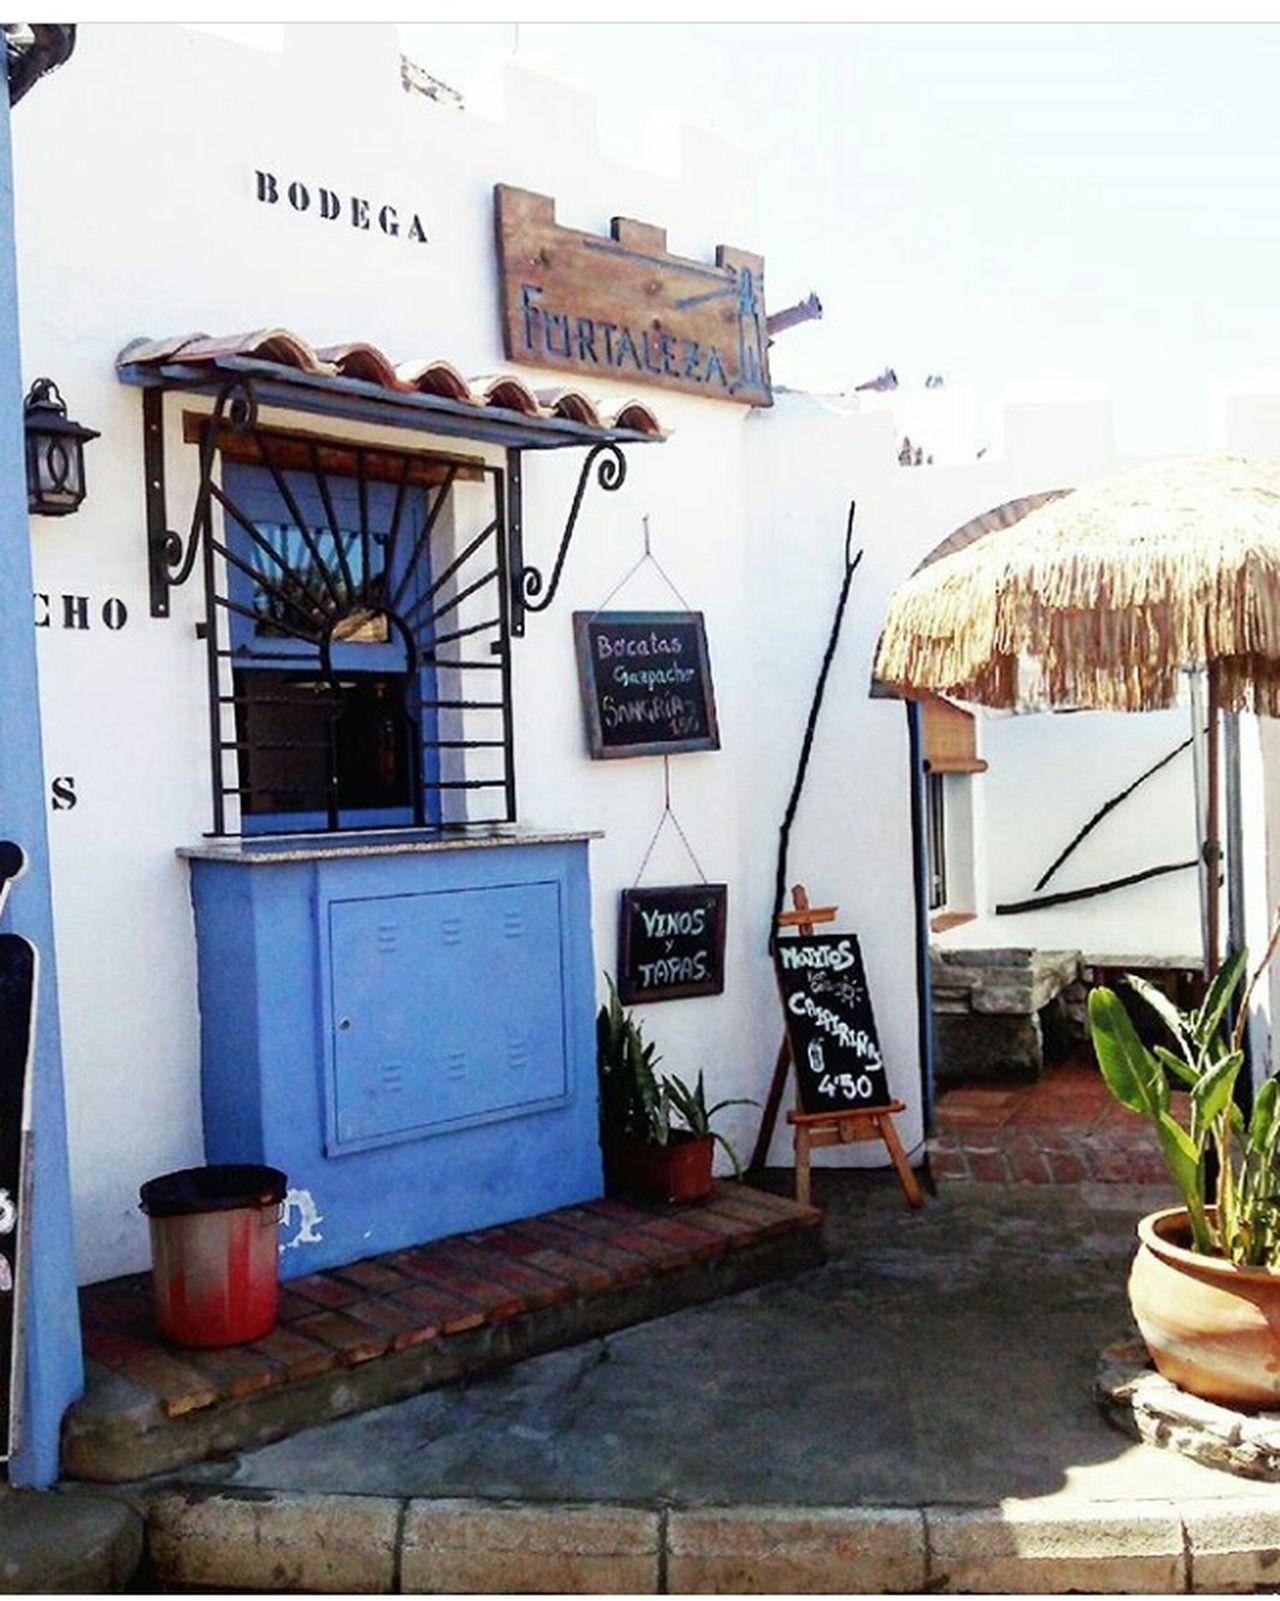 Cádiz, Spain Summertime Cañosdemeca Like Photography Verano Architecture Building Exterior